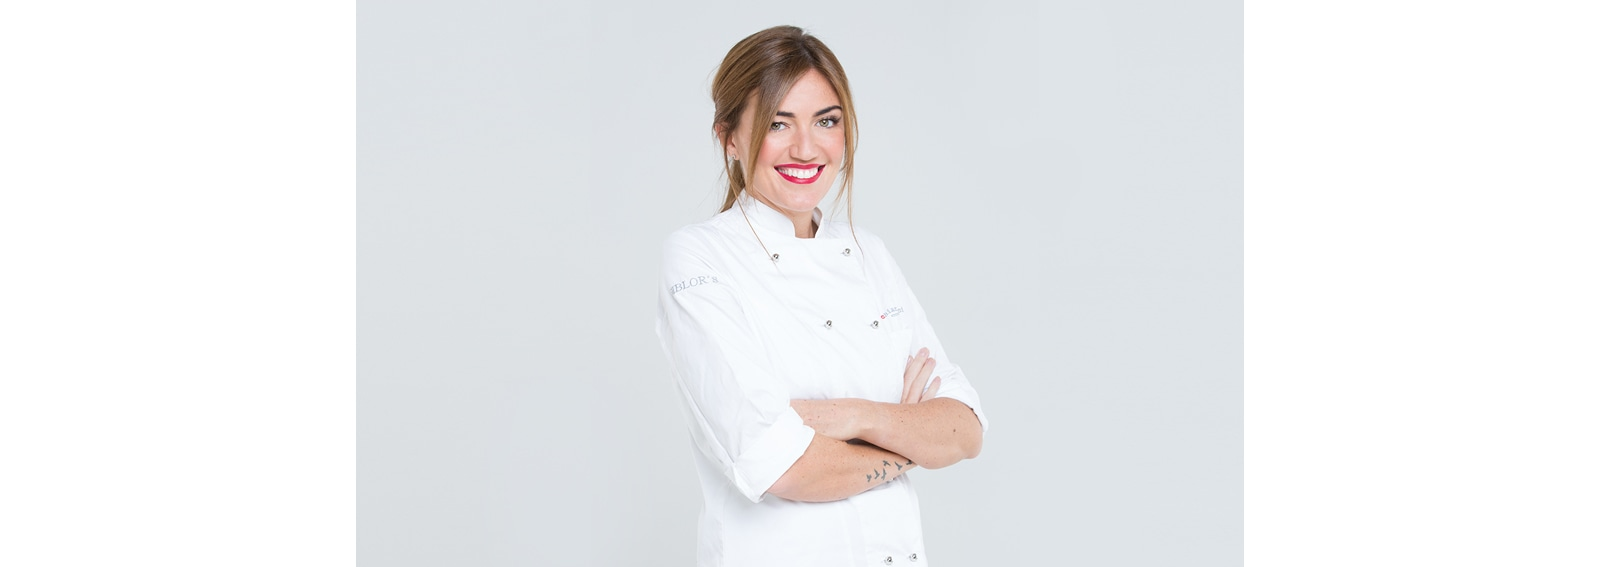 Chiara Maci food blogger per Meritene Proactive hero DESK